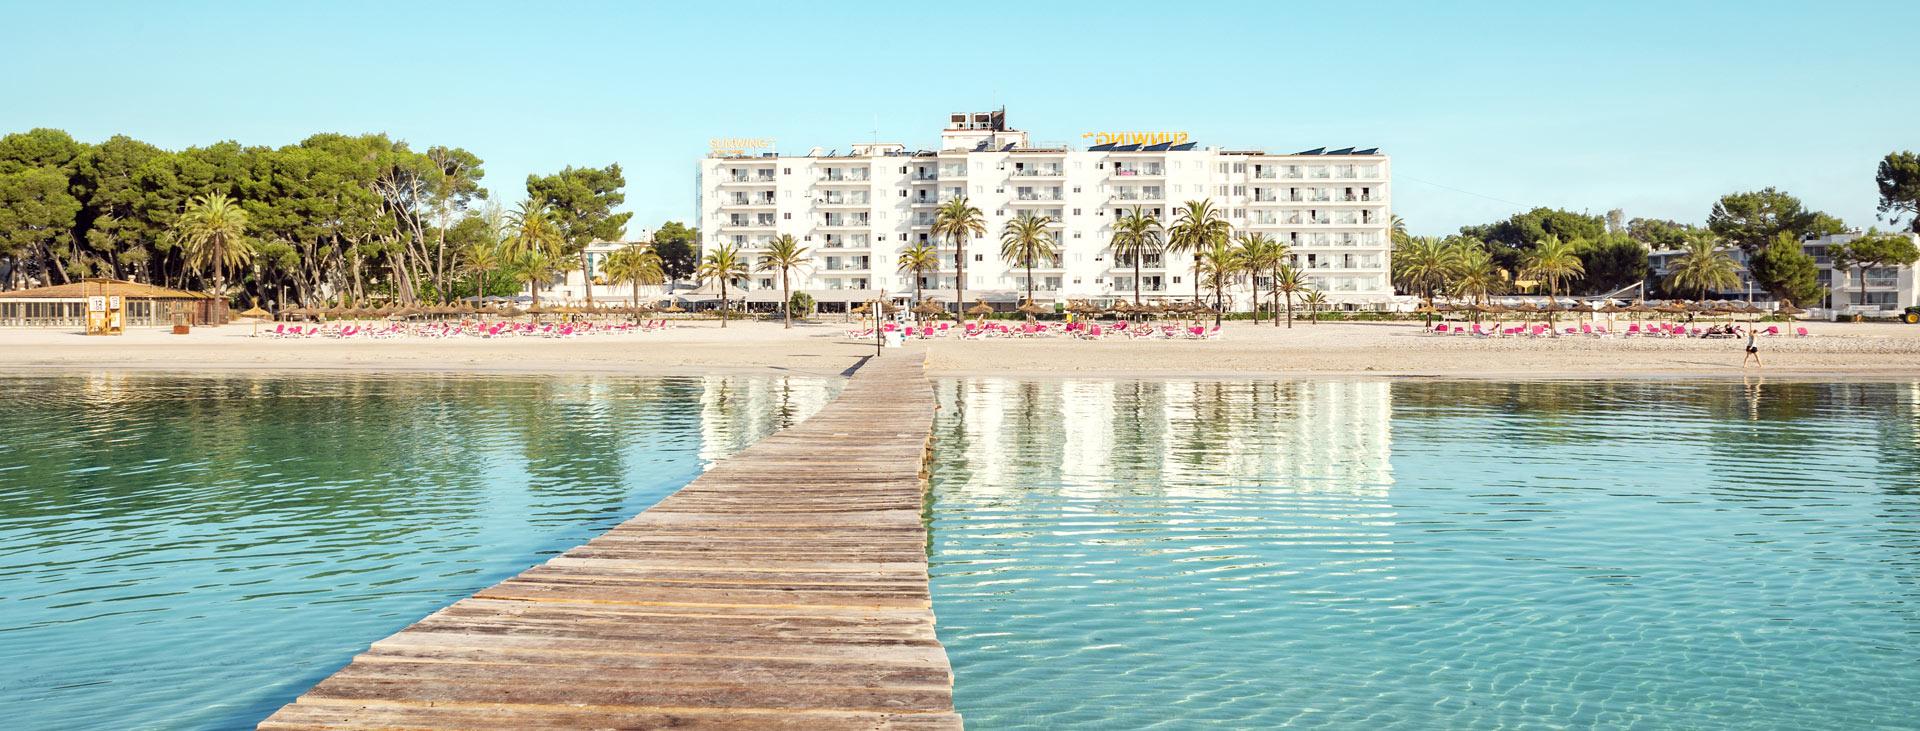 Sunwing Alcudia Beach, Alcudia, Mallorca, Espanja